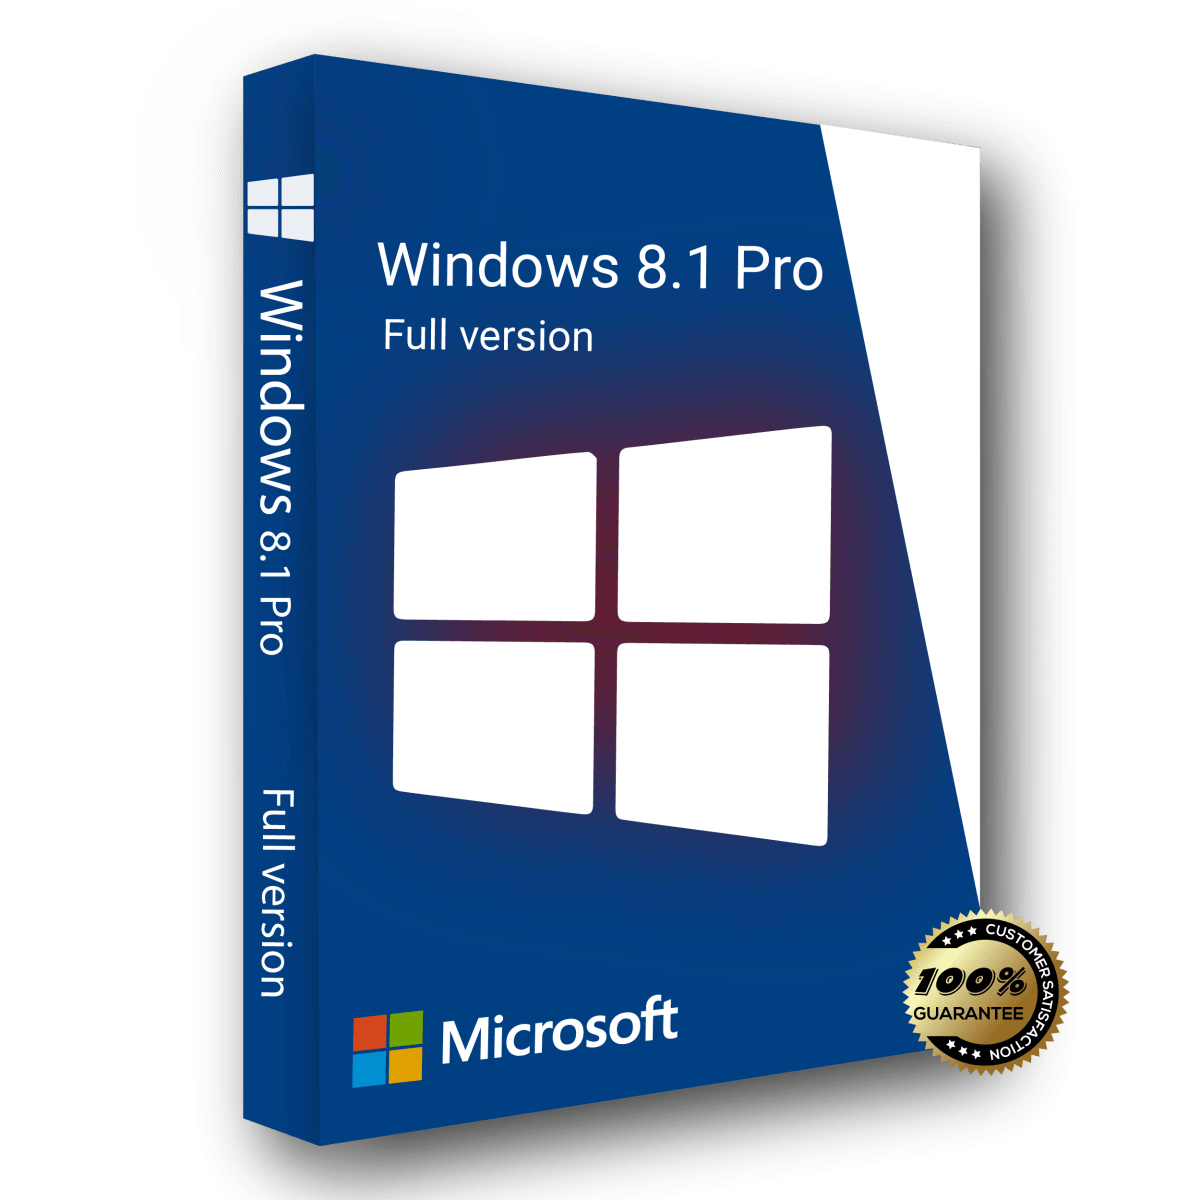 Windows 8.1 Pro Full version